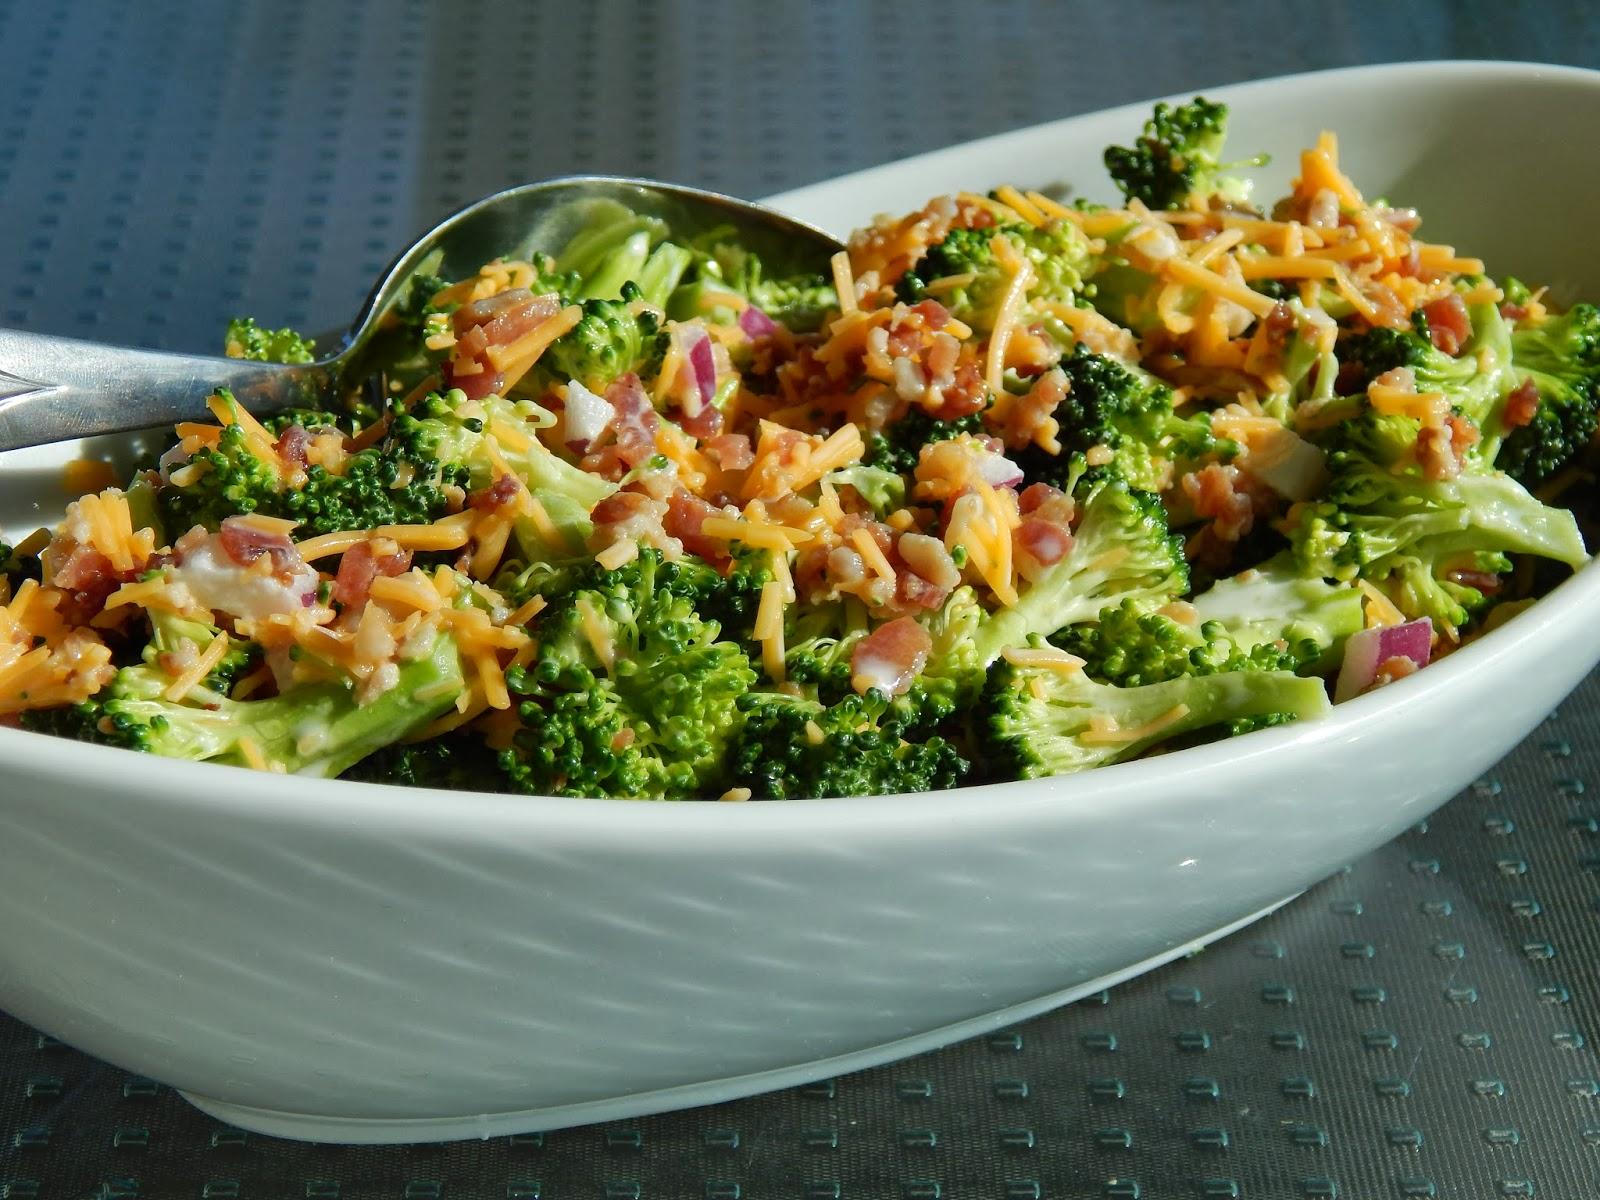 Sweet Amp Tangy Broccoli Salad Cut The Wheat